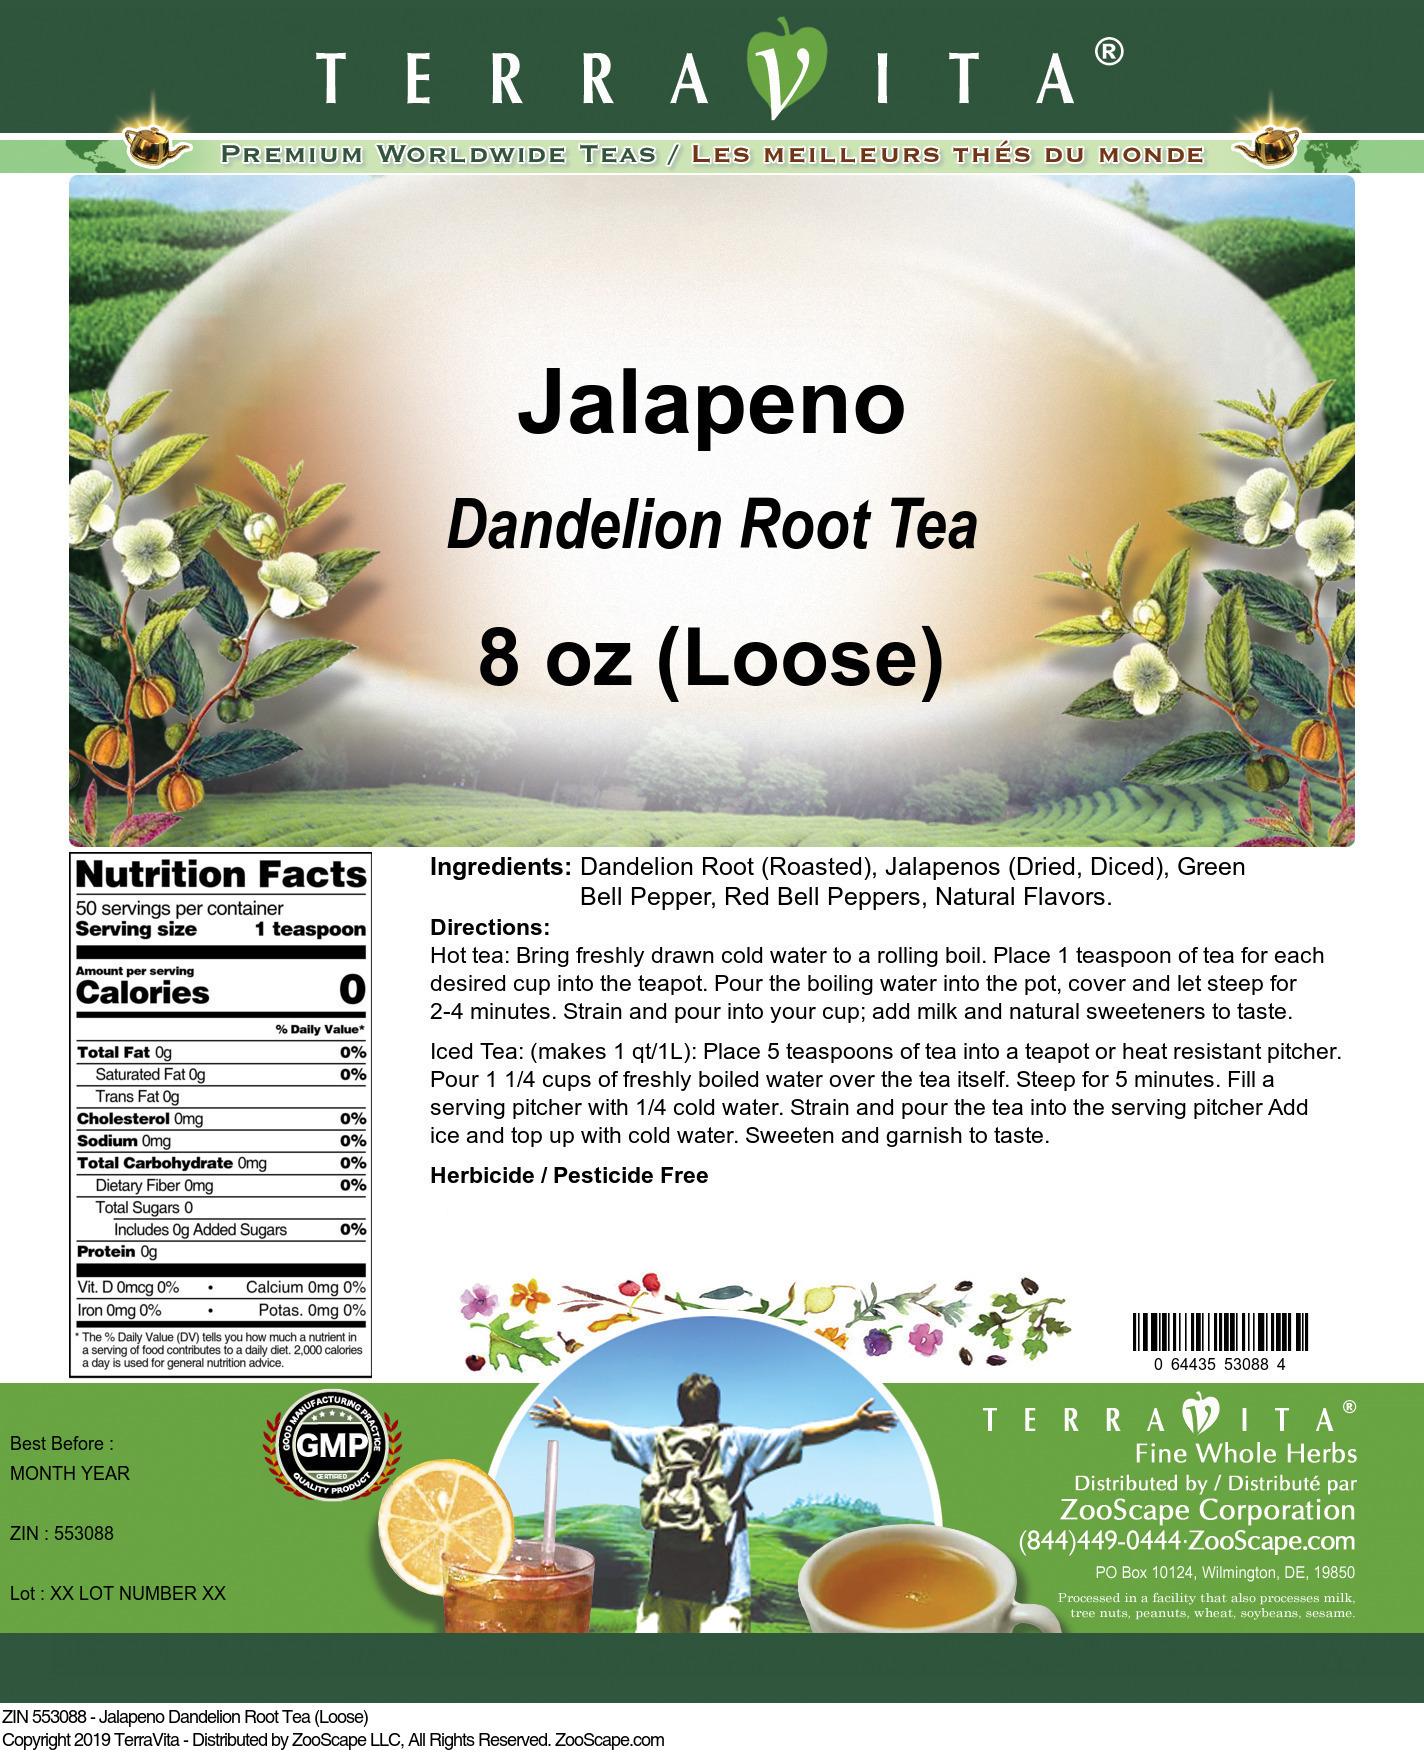 Jalapeno Dandelion Root